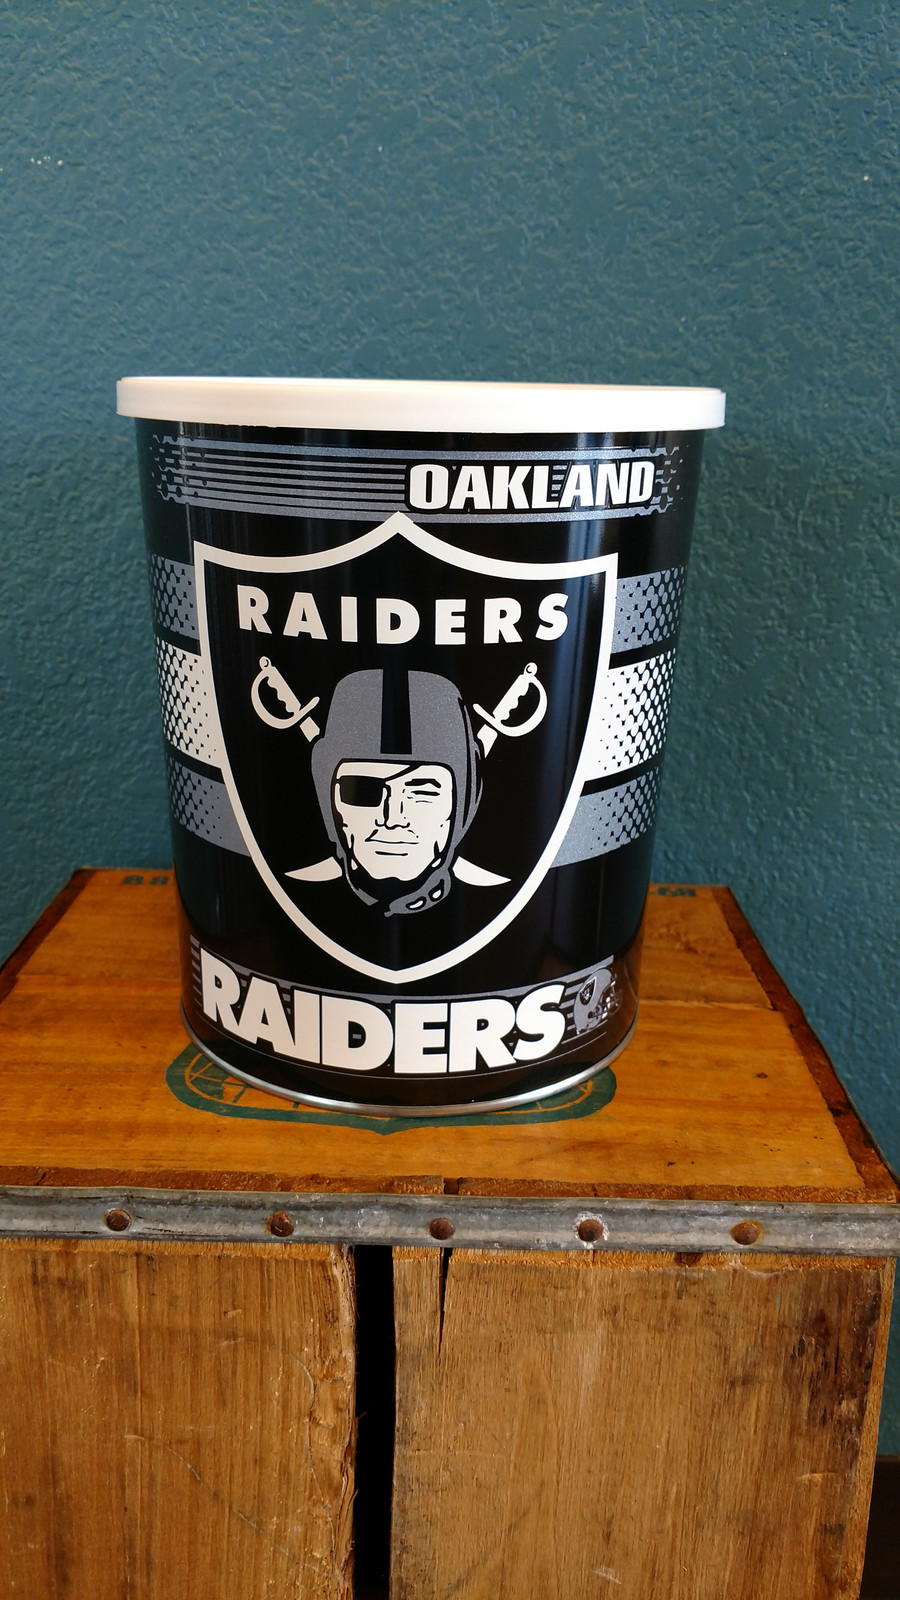 Oakland Raider 1 Gallon Popcorn TIn